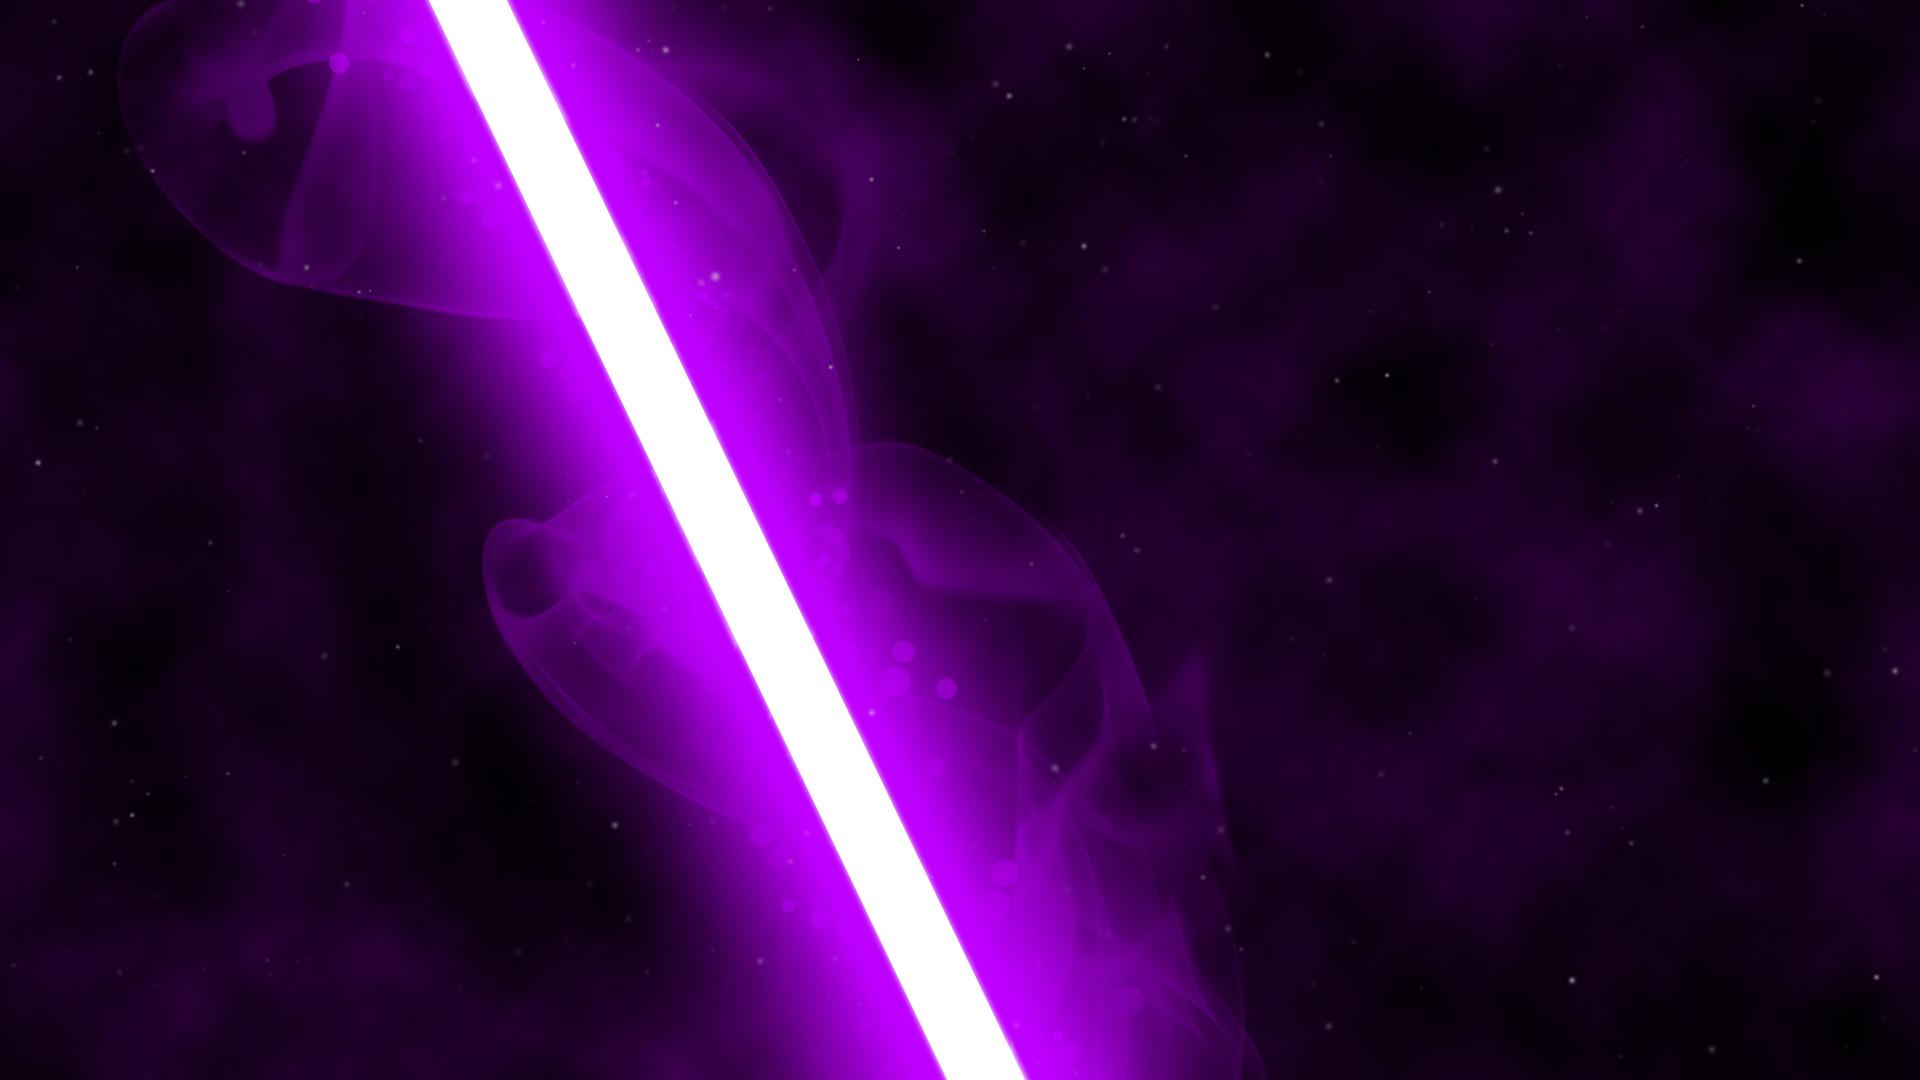 48+] Purple Lightsaber Wallpaper on